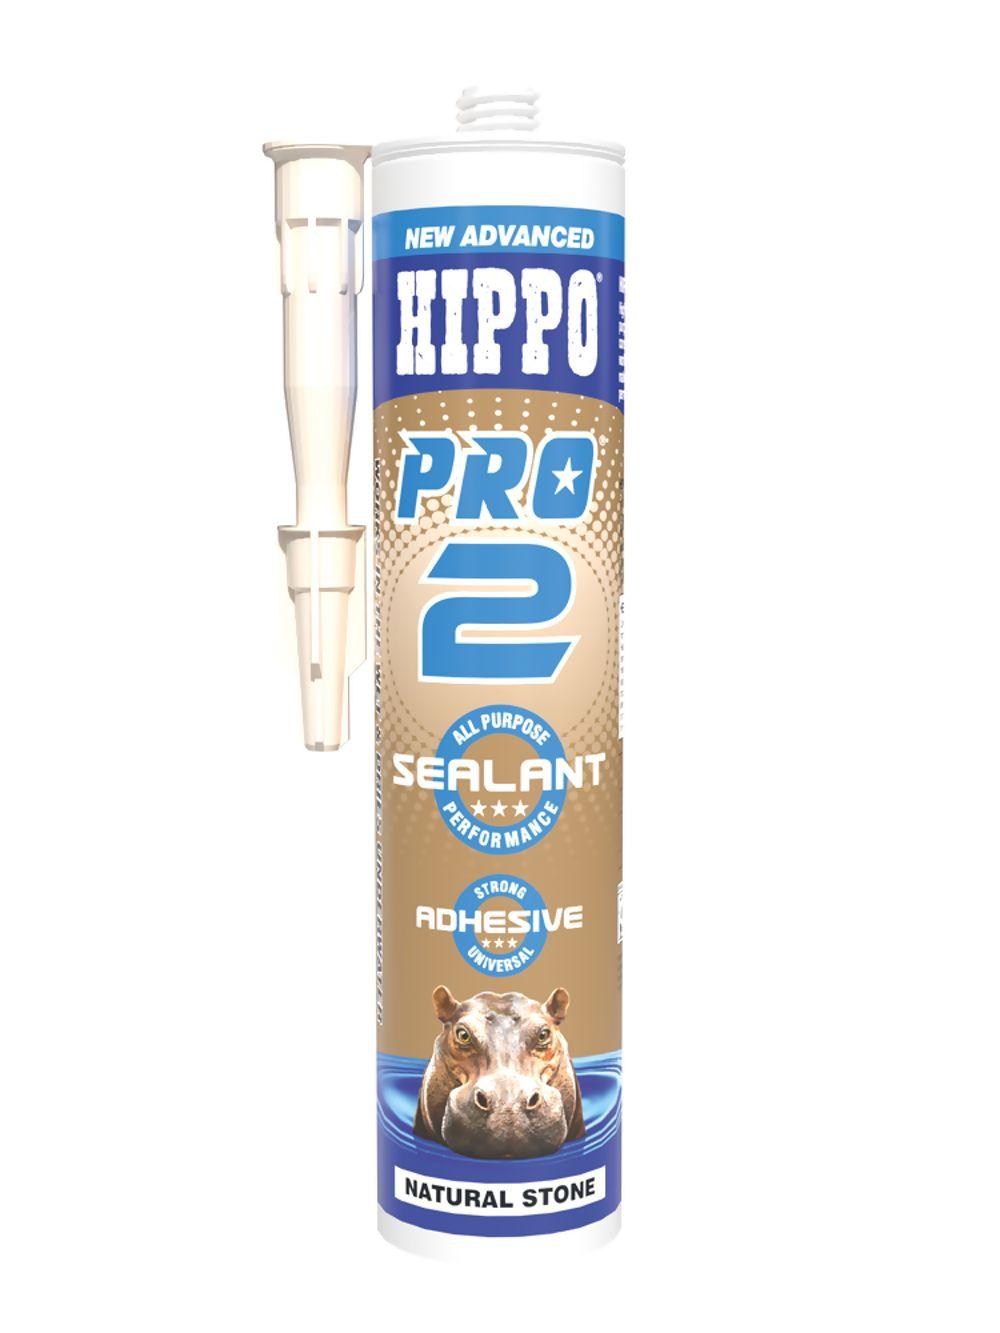 Hippo Pro 2 Sealant & Adhesive Nat Stone 310ml Ref H18541